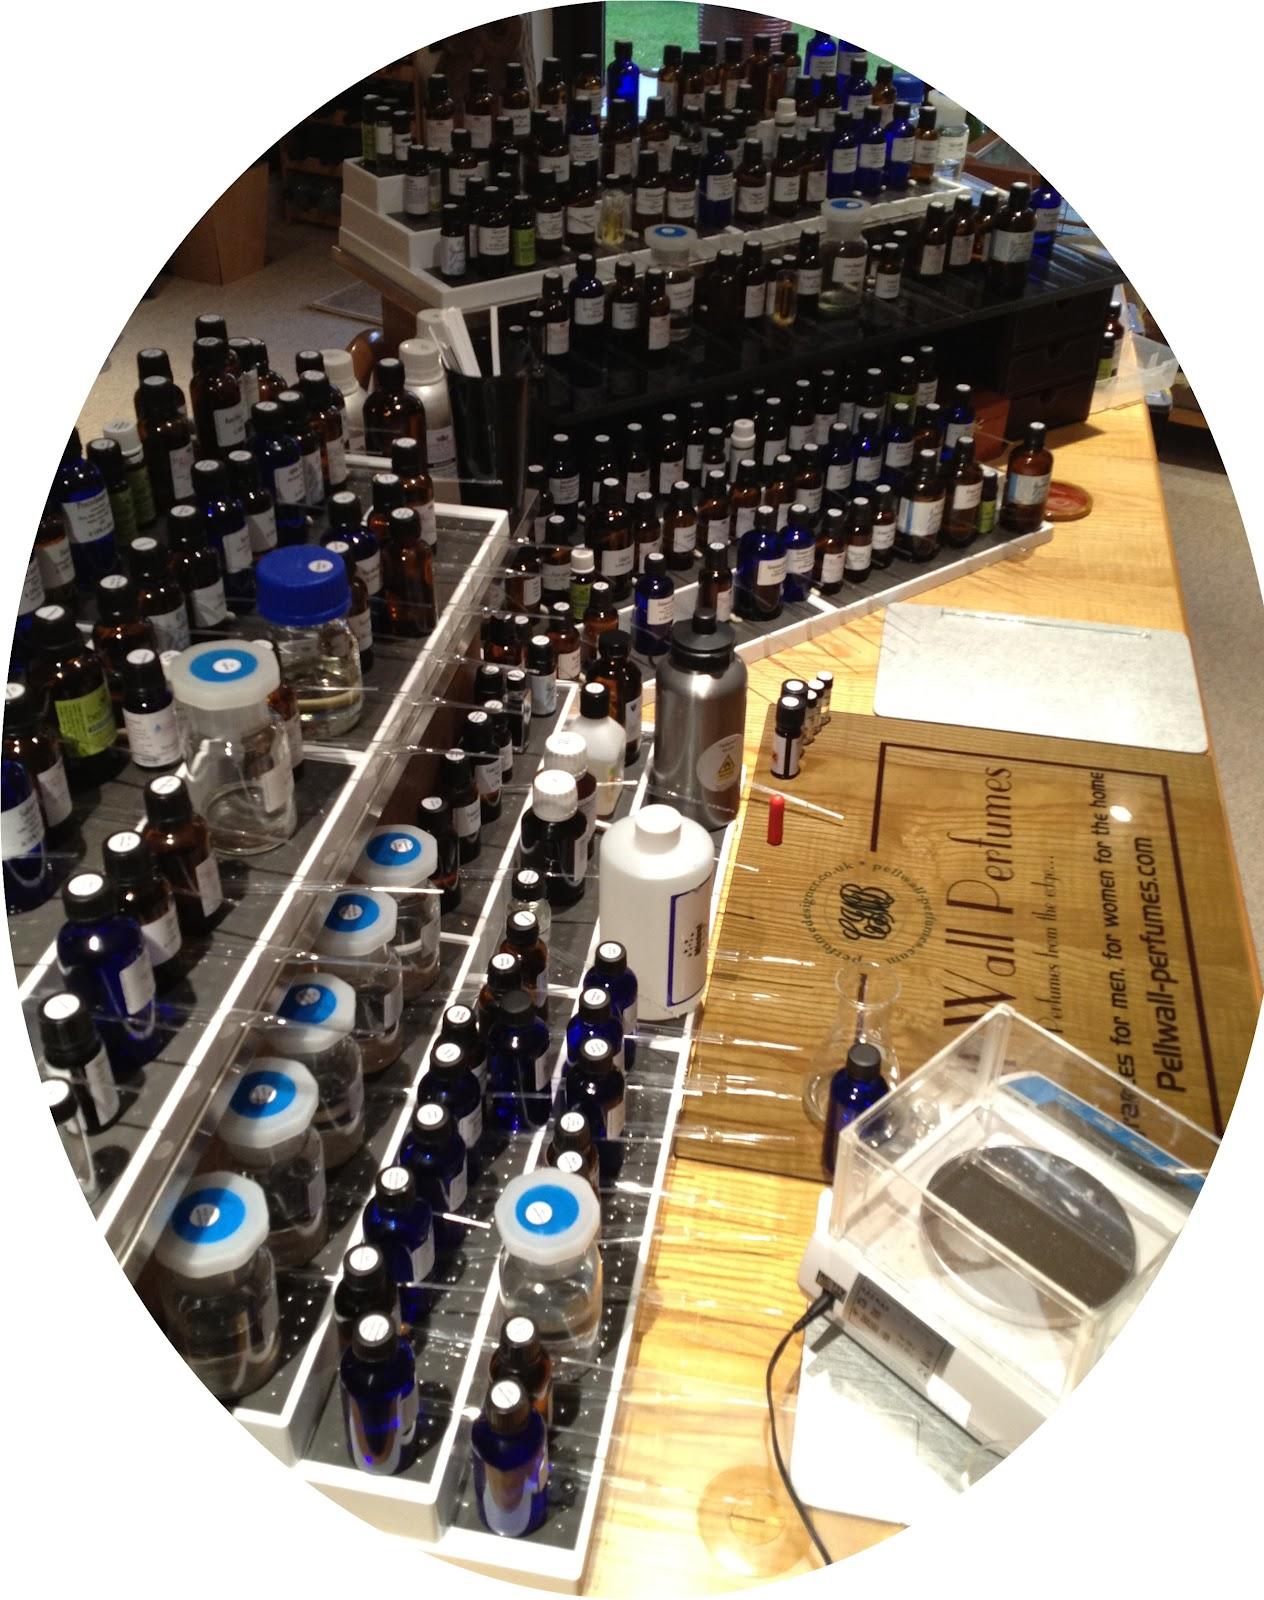 pell wall perfumes blog starter kit for diy perfume making. Black Bedroom Furniture Sets. Home Design Ideas